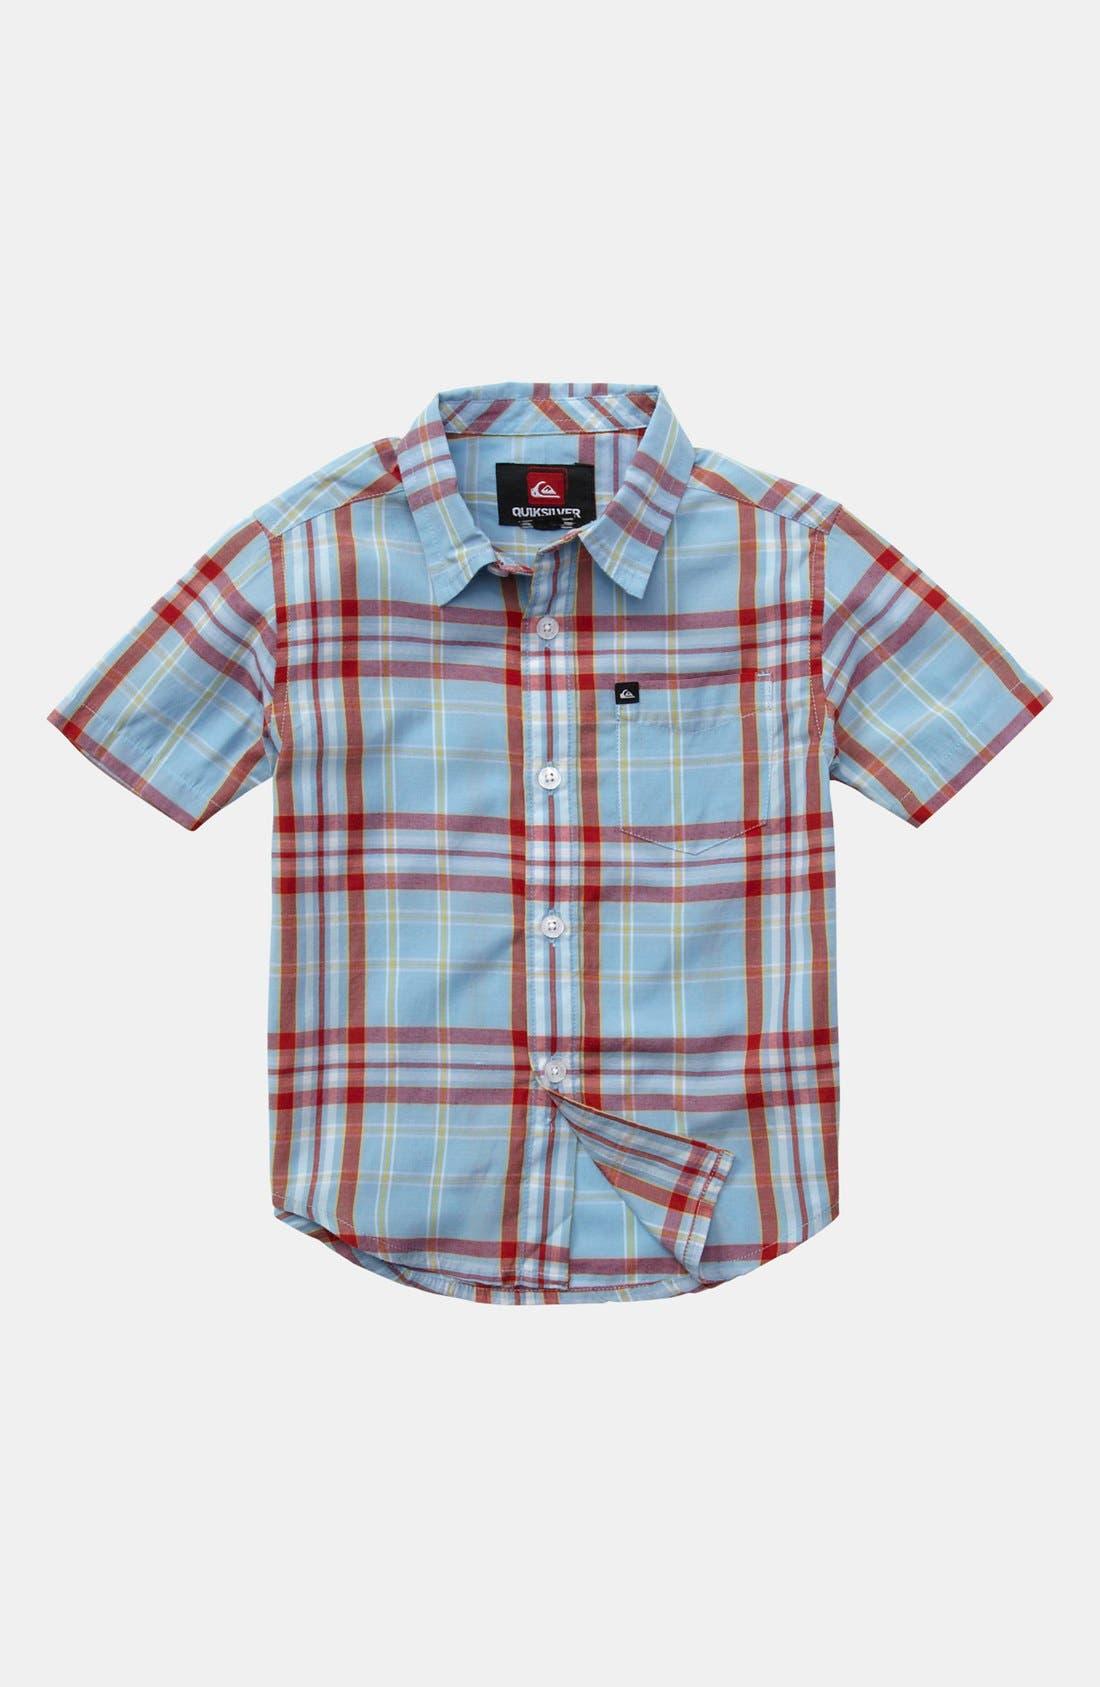 Main Image - Quiksilver 'Uncle Pat' Plaid Shirt (Baby Boys)